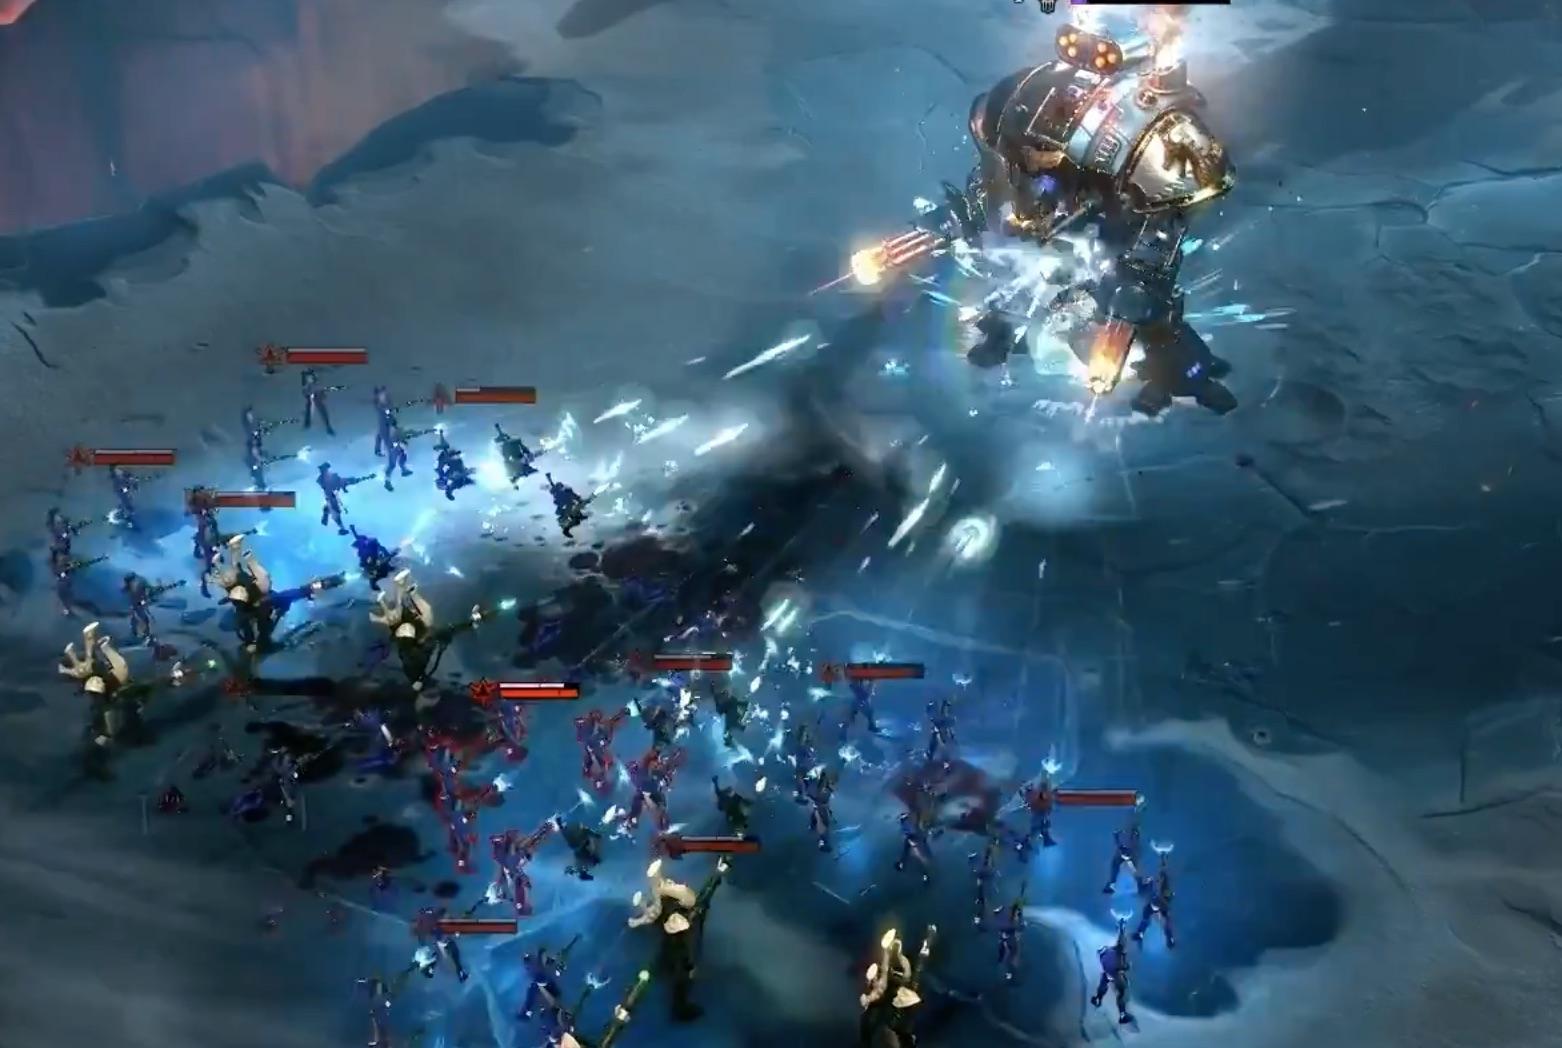 Knight vs Eldar Dawn of War III